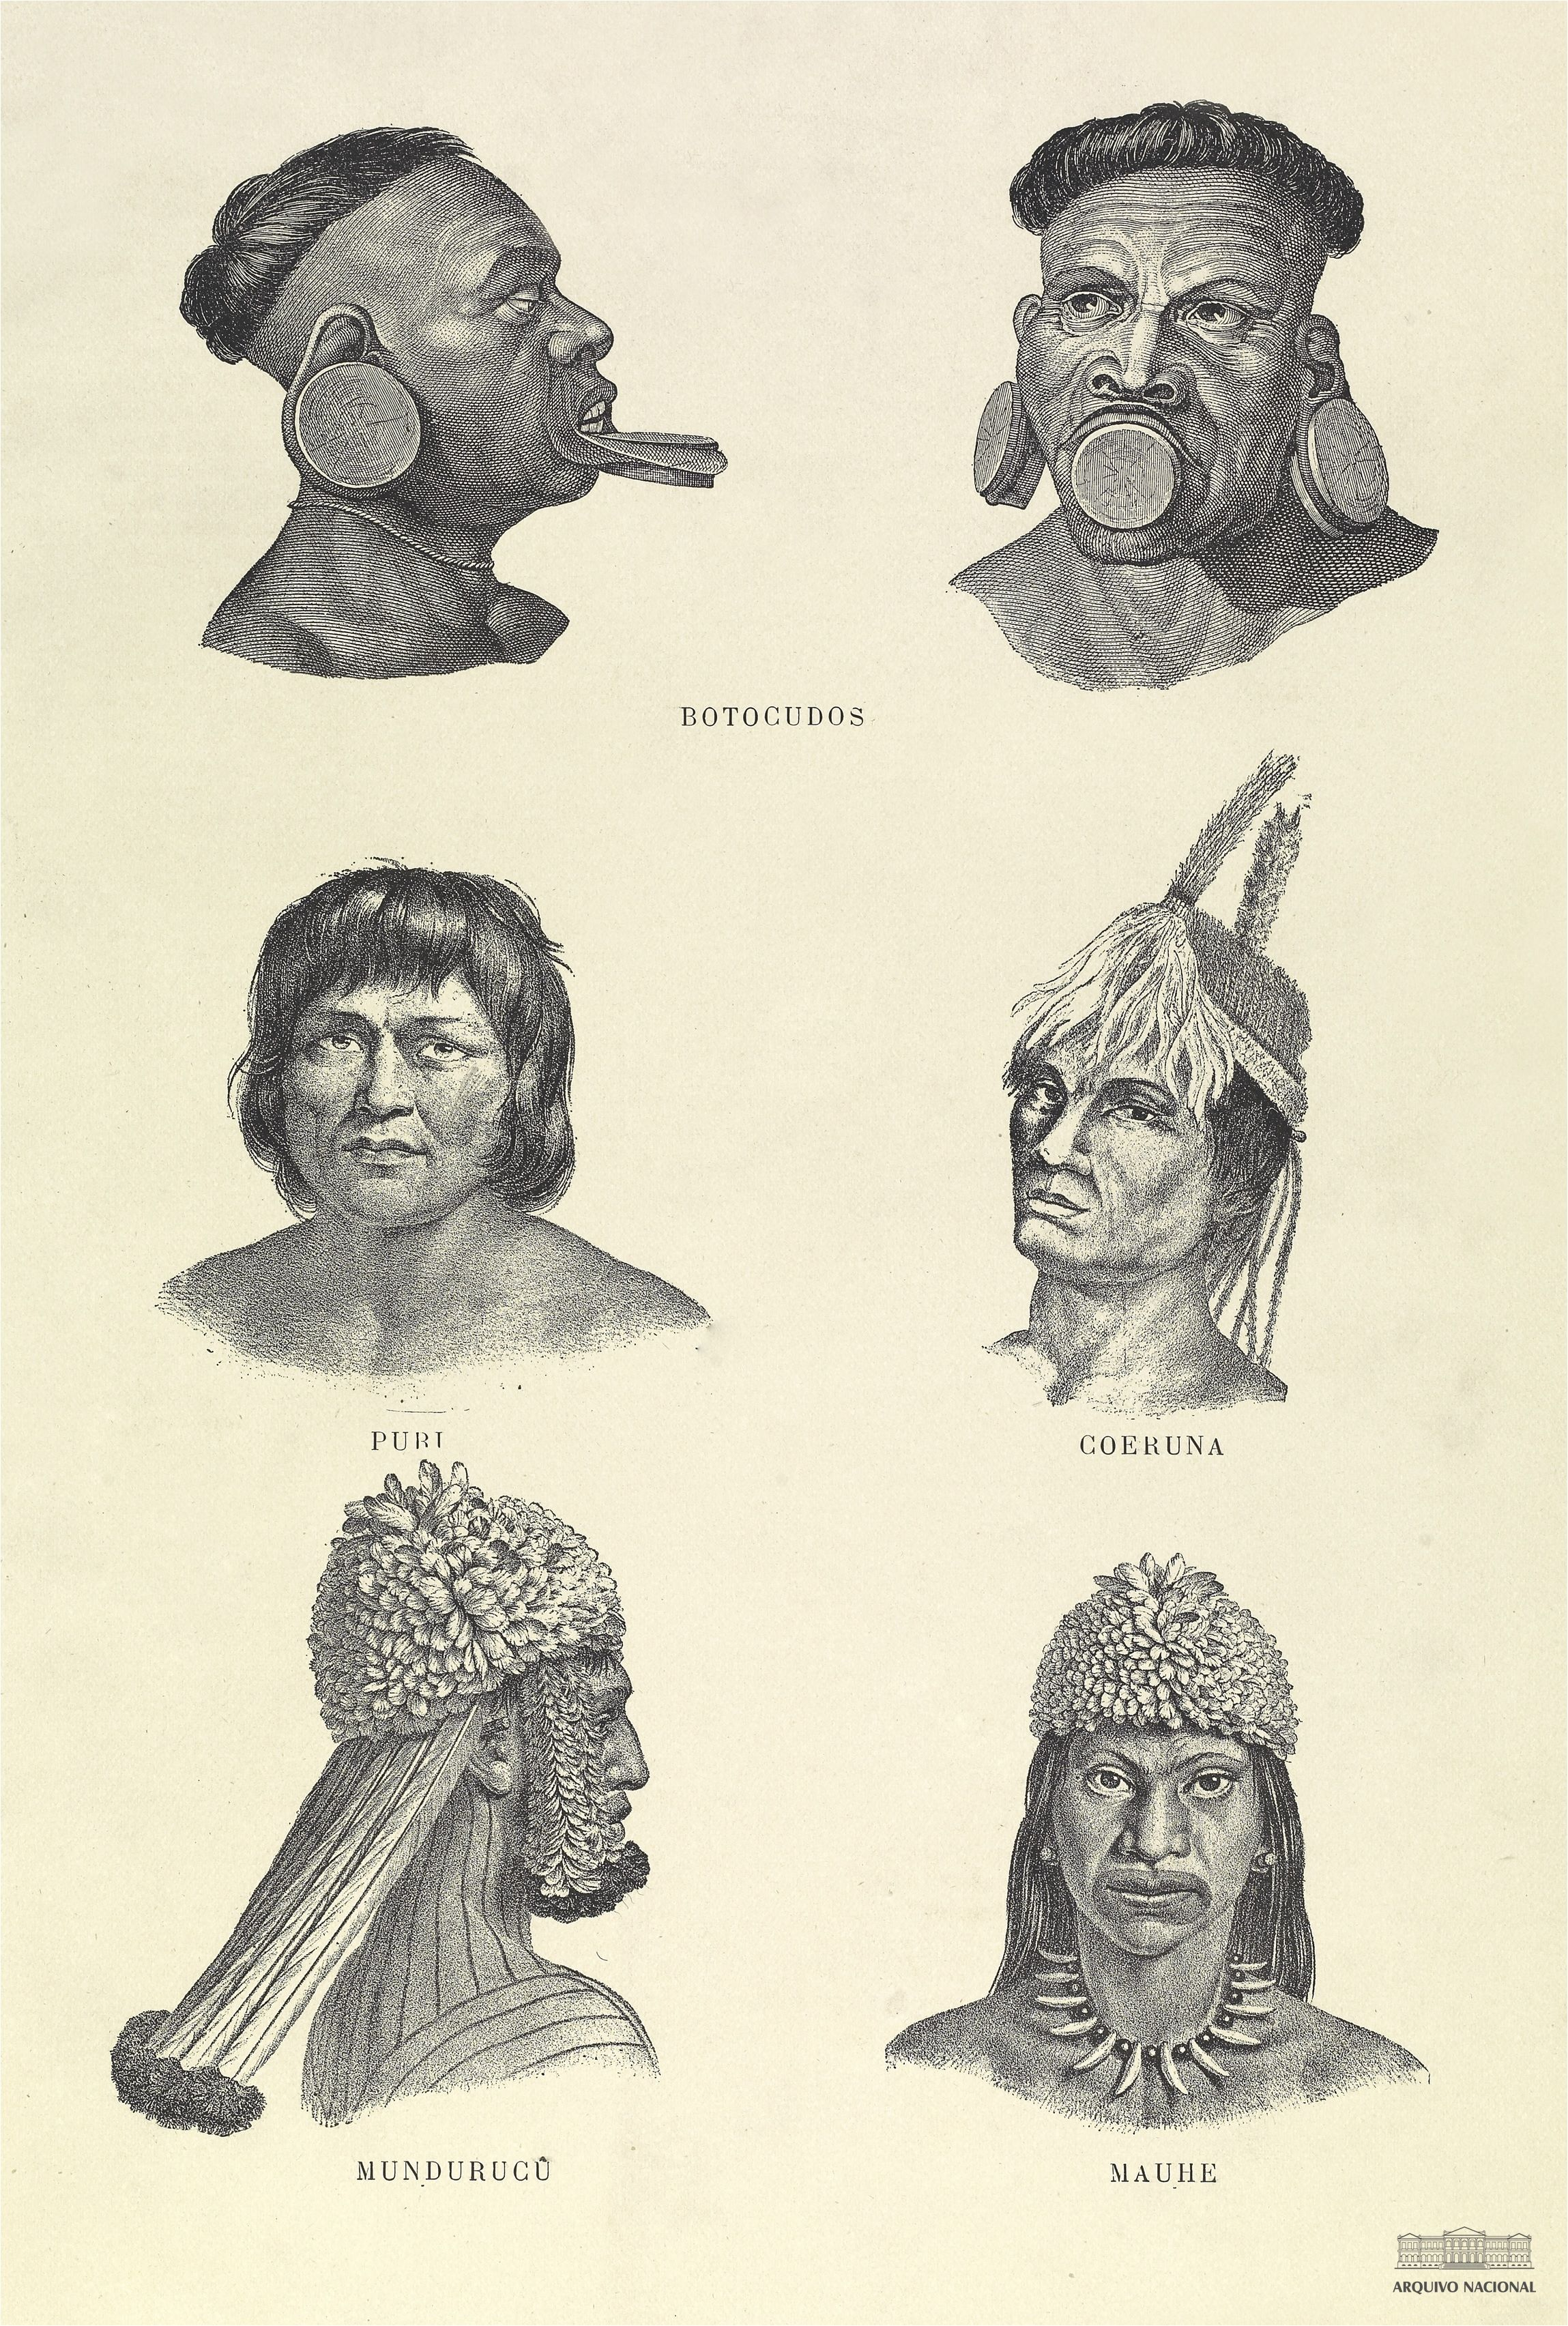 Indigenas Seculo Xix Le Bresil De Pierre Emile Levasseur 1899